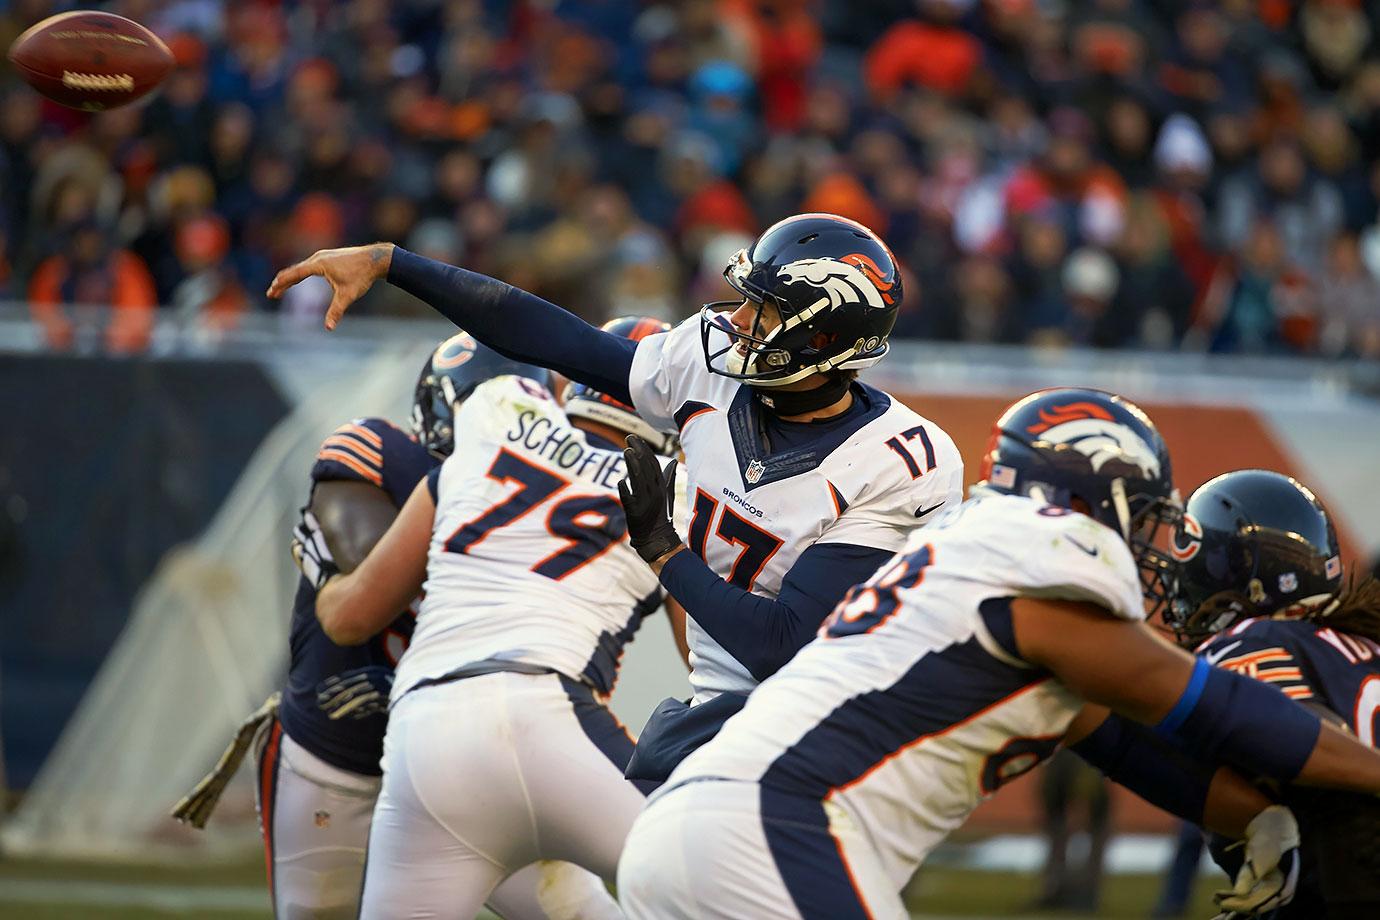 2015 Team: Denver Broncos — 2016 Team: Houston Texans